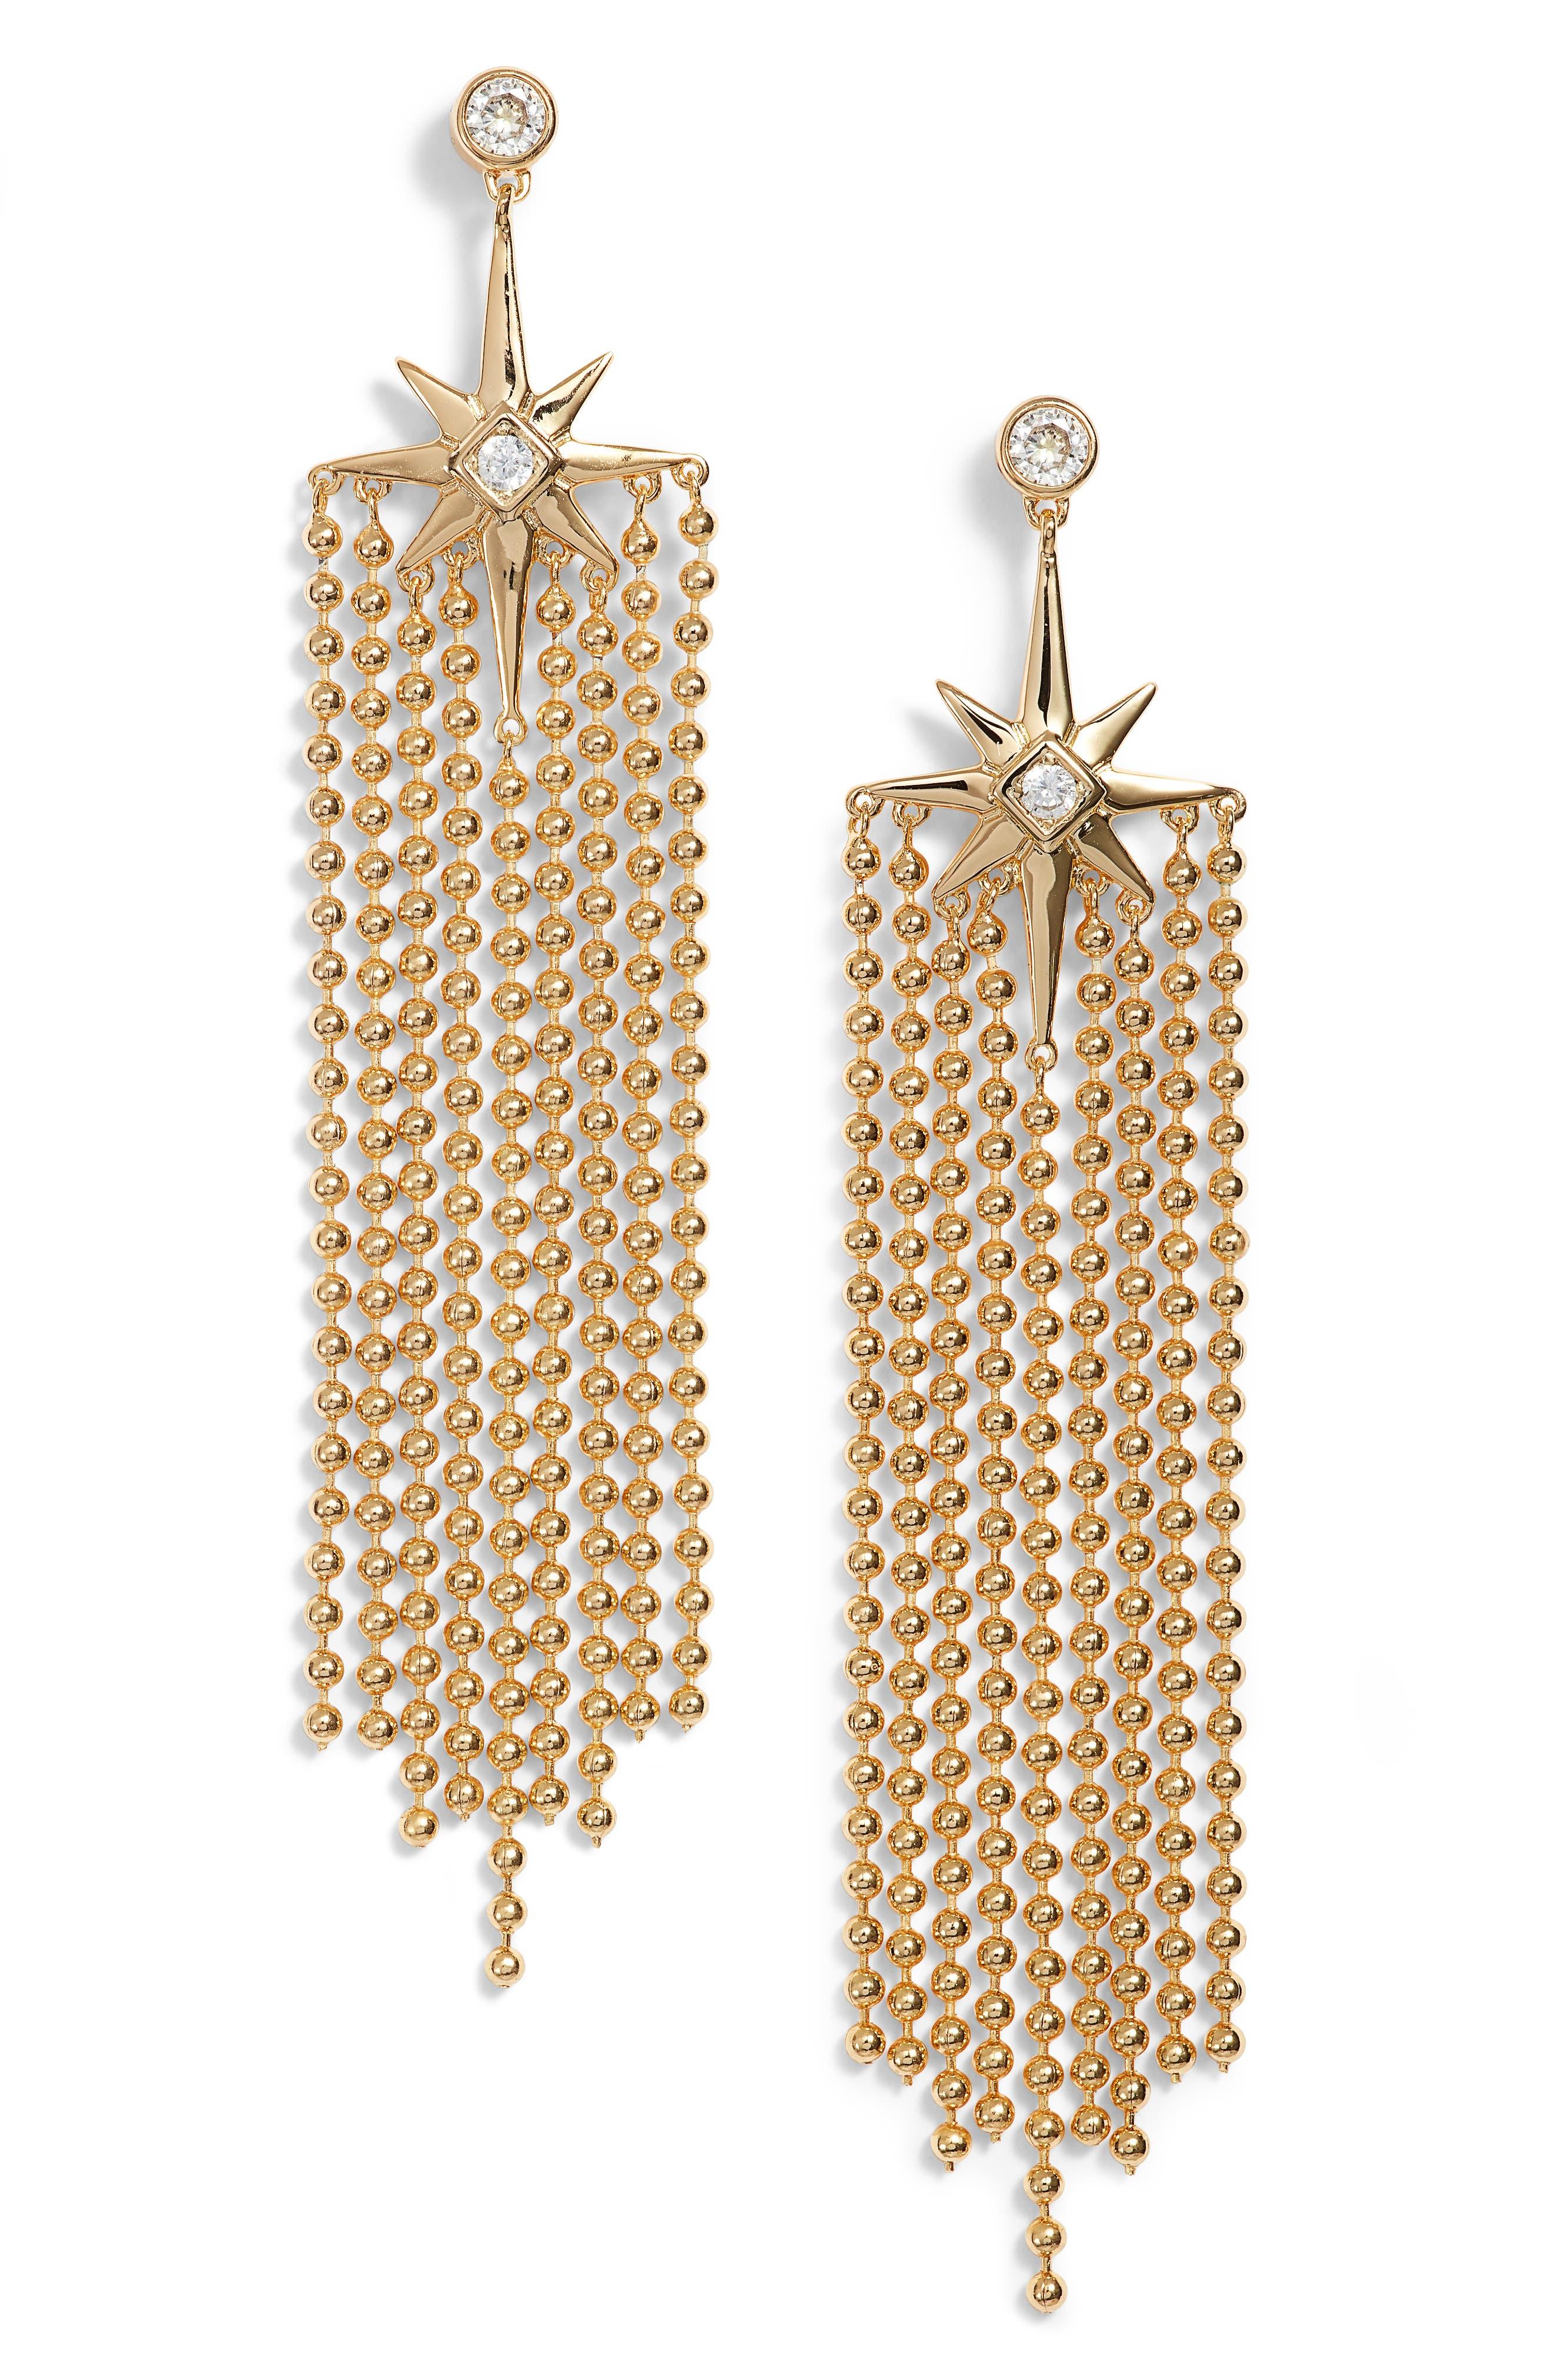 Main Image - Jules Smith Elysian Fringe Earrings